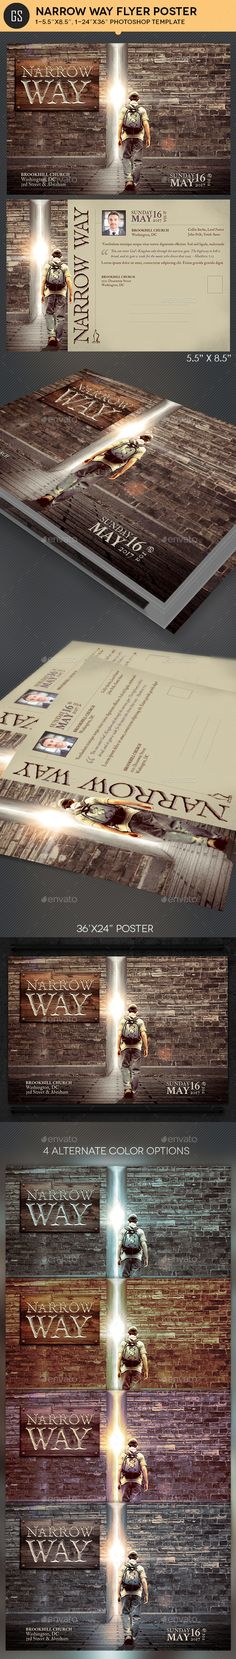 Narrow Way Flyer Poster Template - Church Flyers